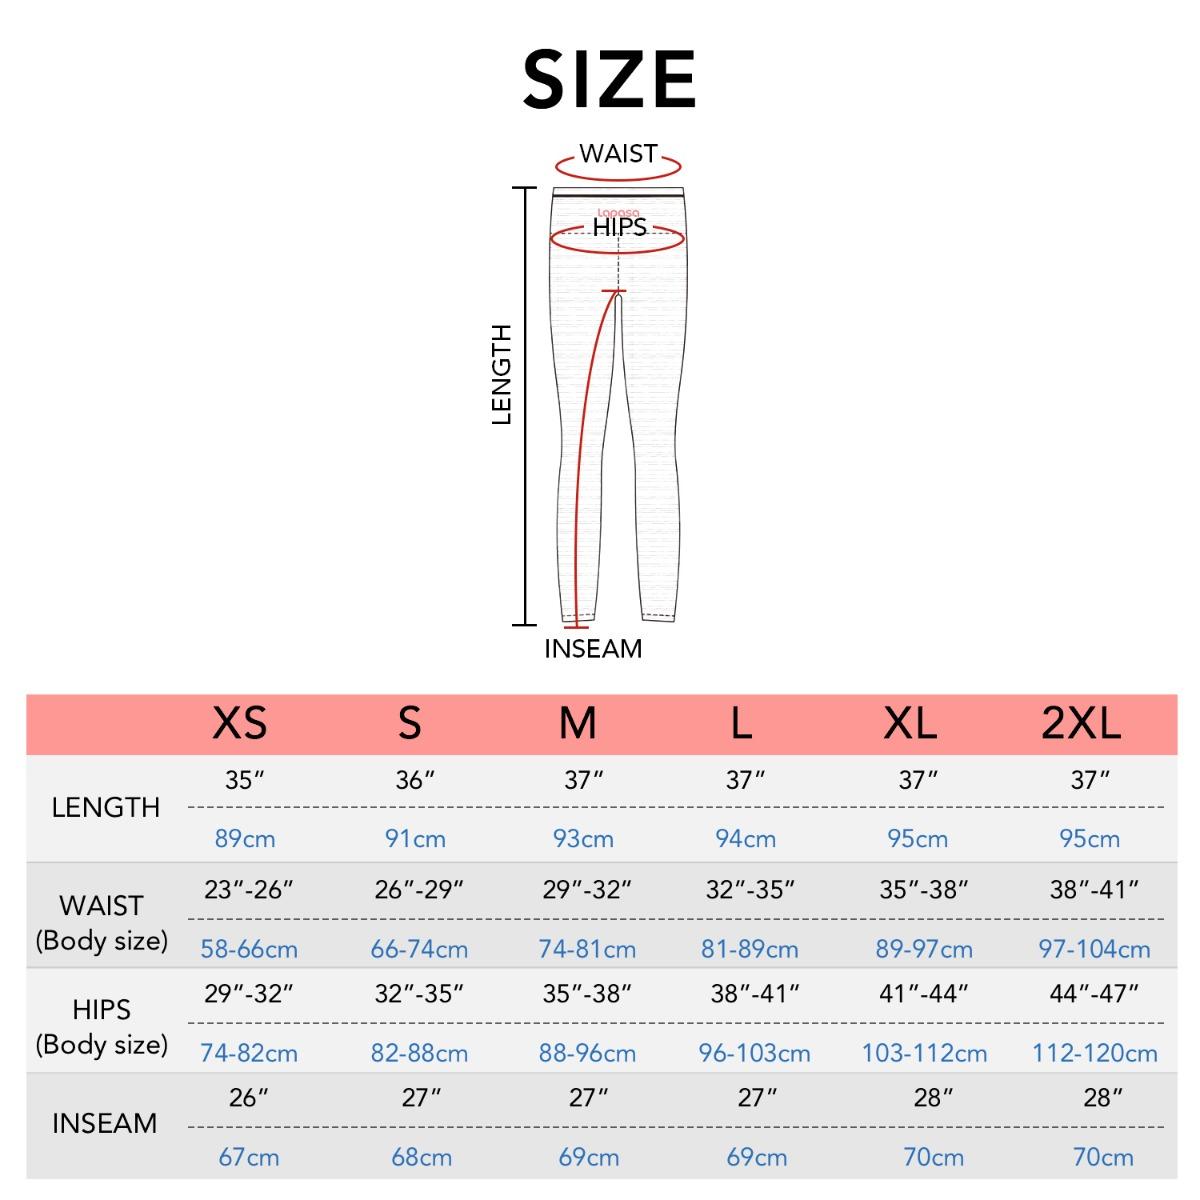 L22 size chart